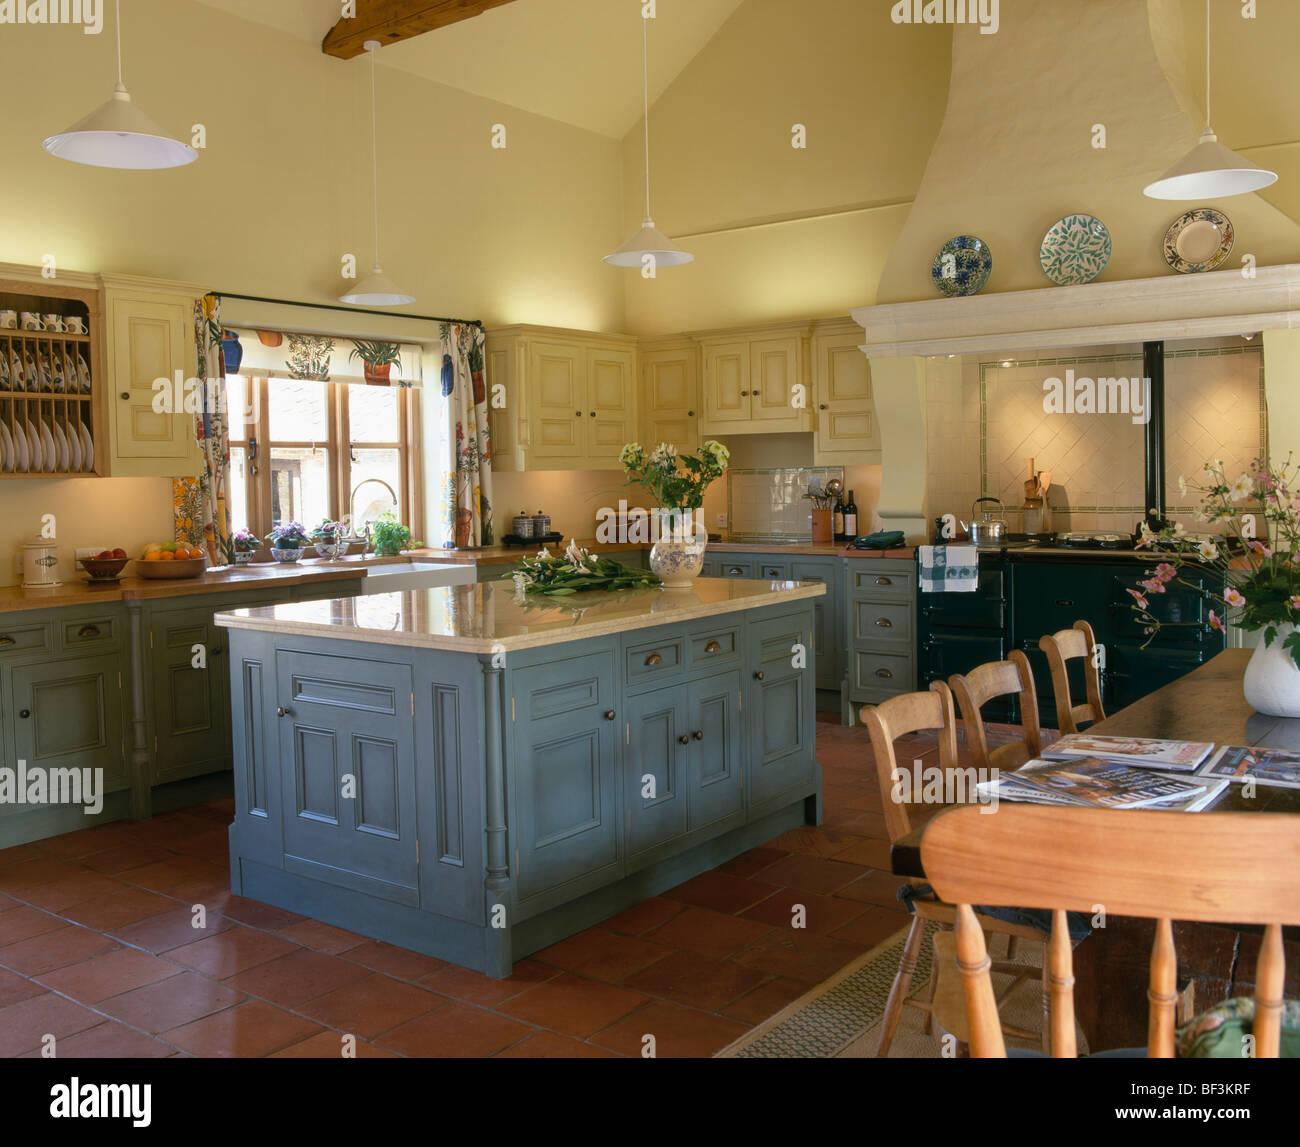 Island Units For Kitchens: Interiors Traditional Kitchens Island Units Stock Photos